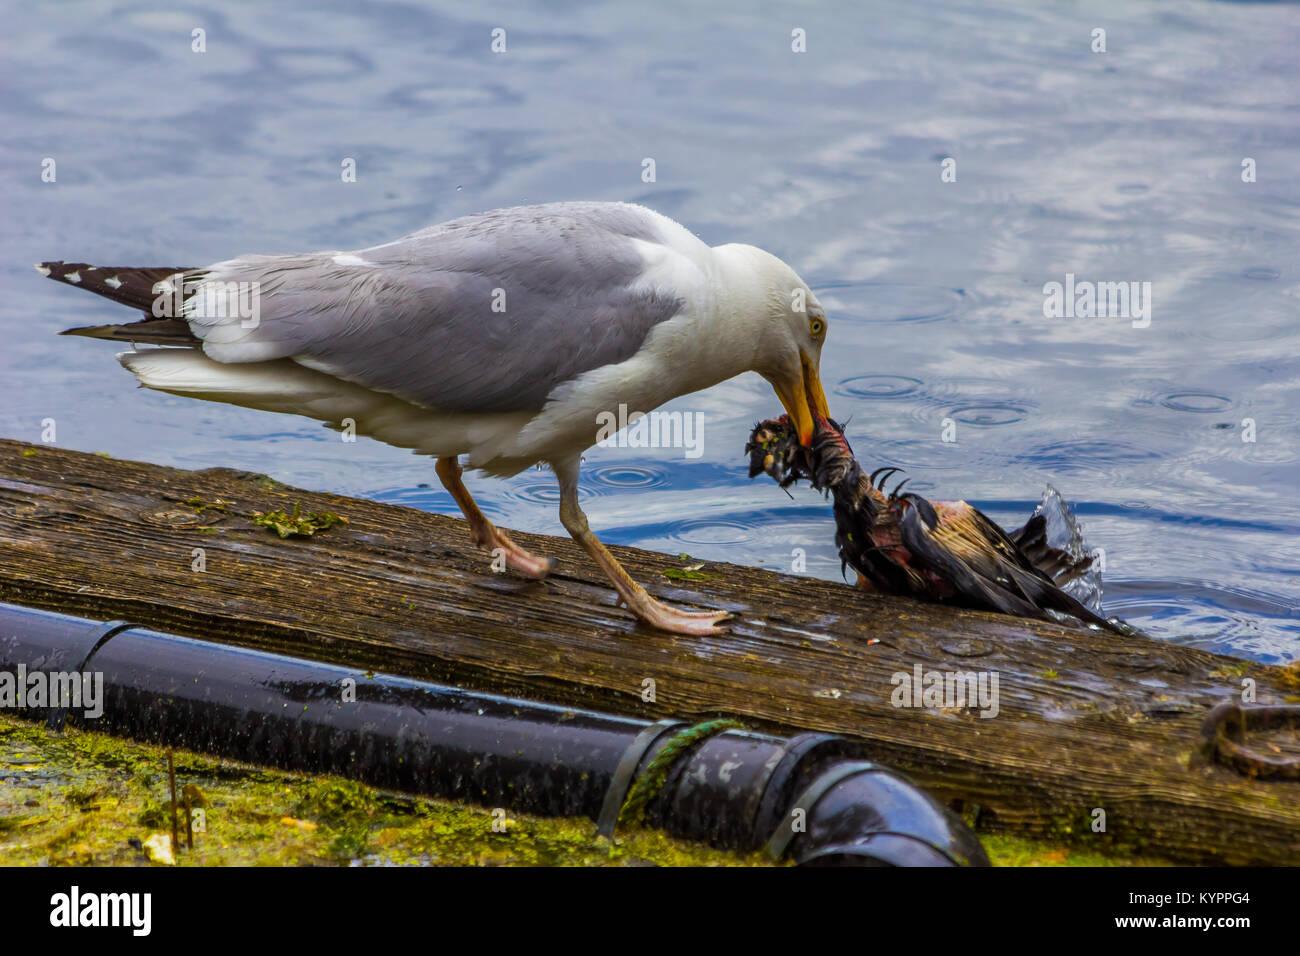 Seagull eating bird, Carnivore. Stock Photo